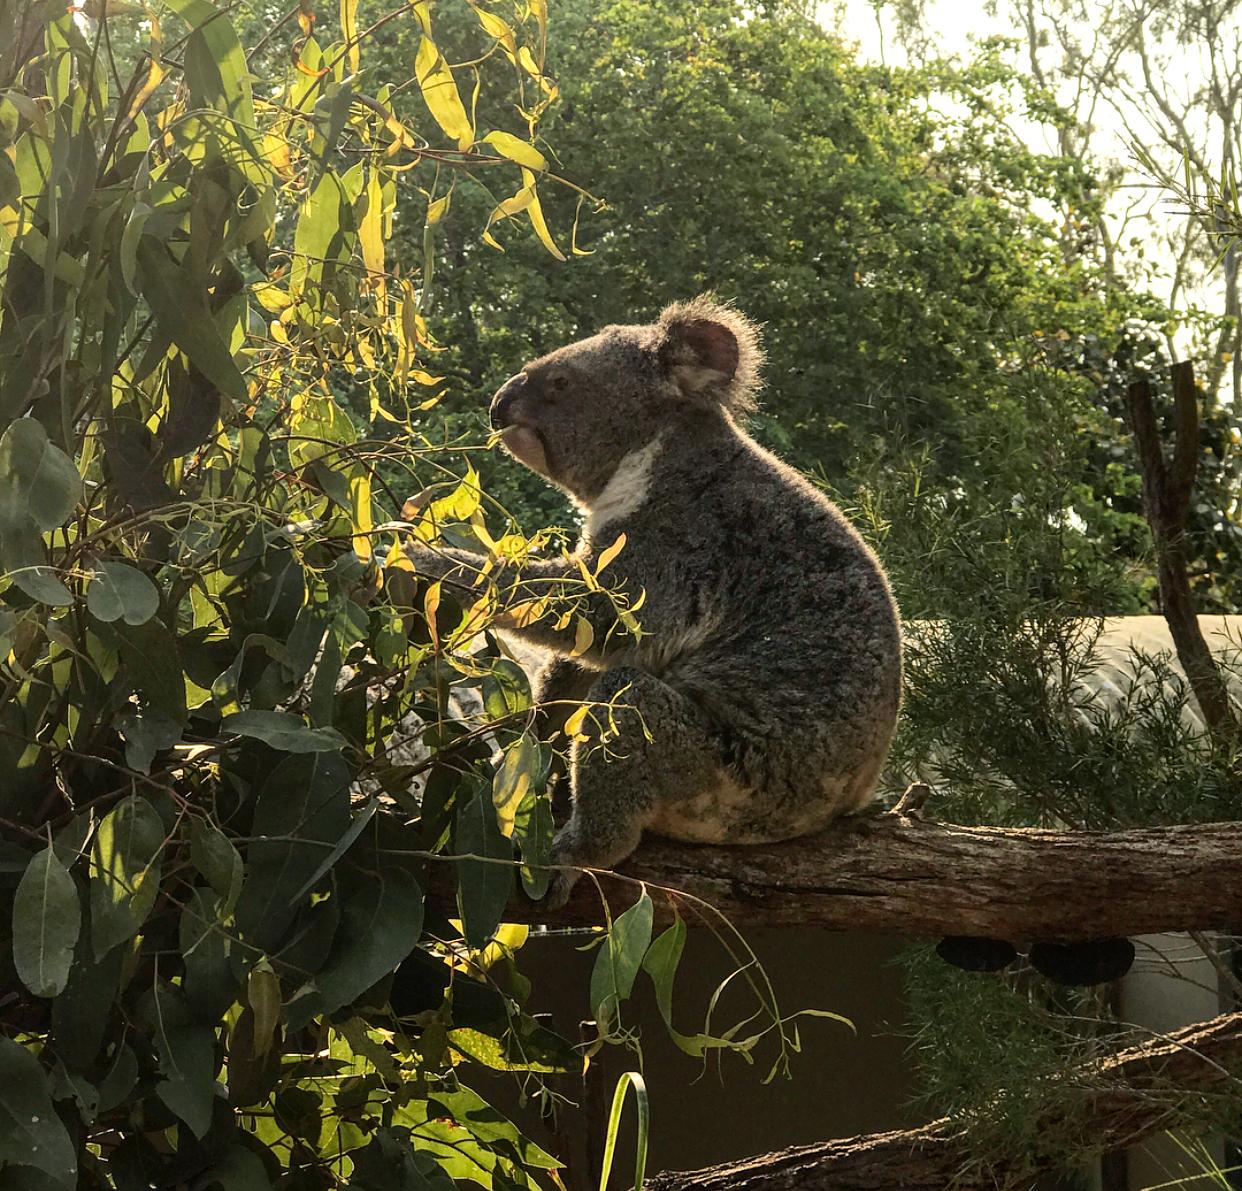 A cheeky koala munching on some leaves at Rockhampton zoo.